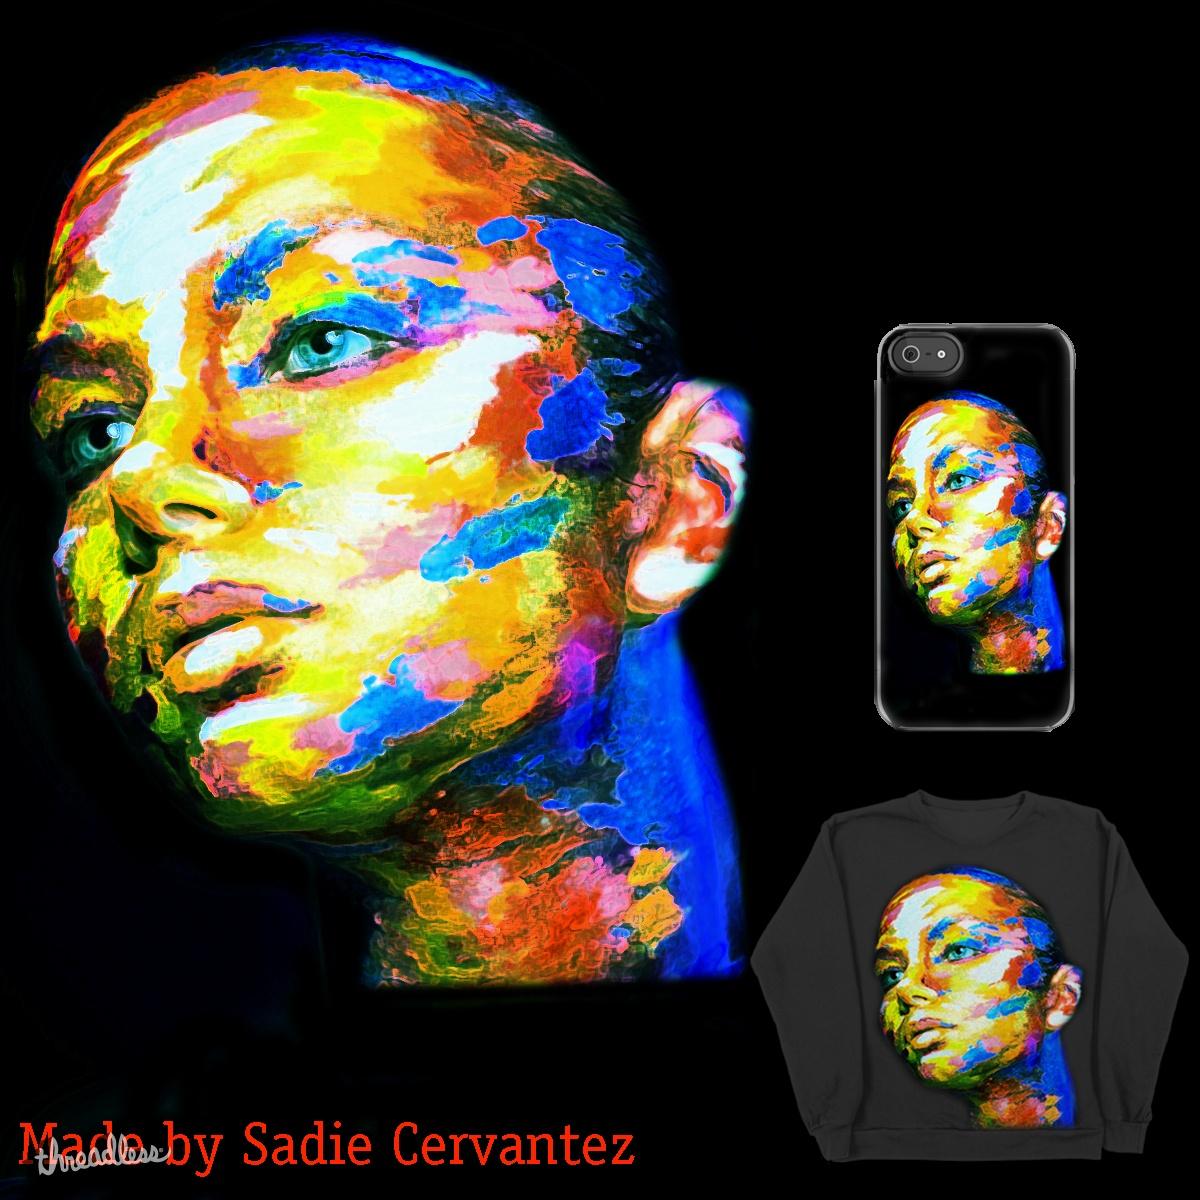 Think of me by SadieCervantez on Threadless